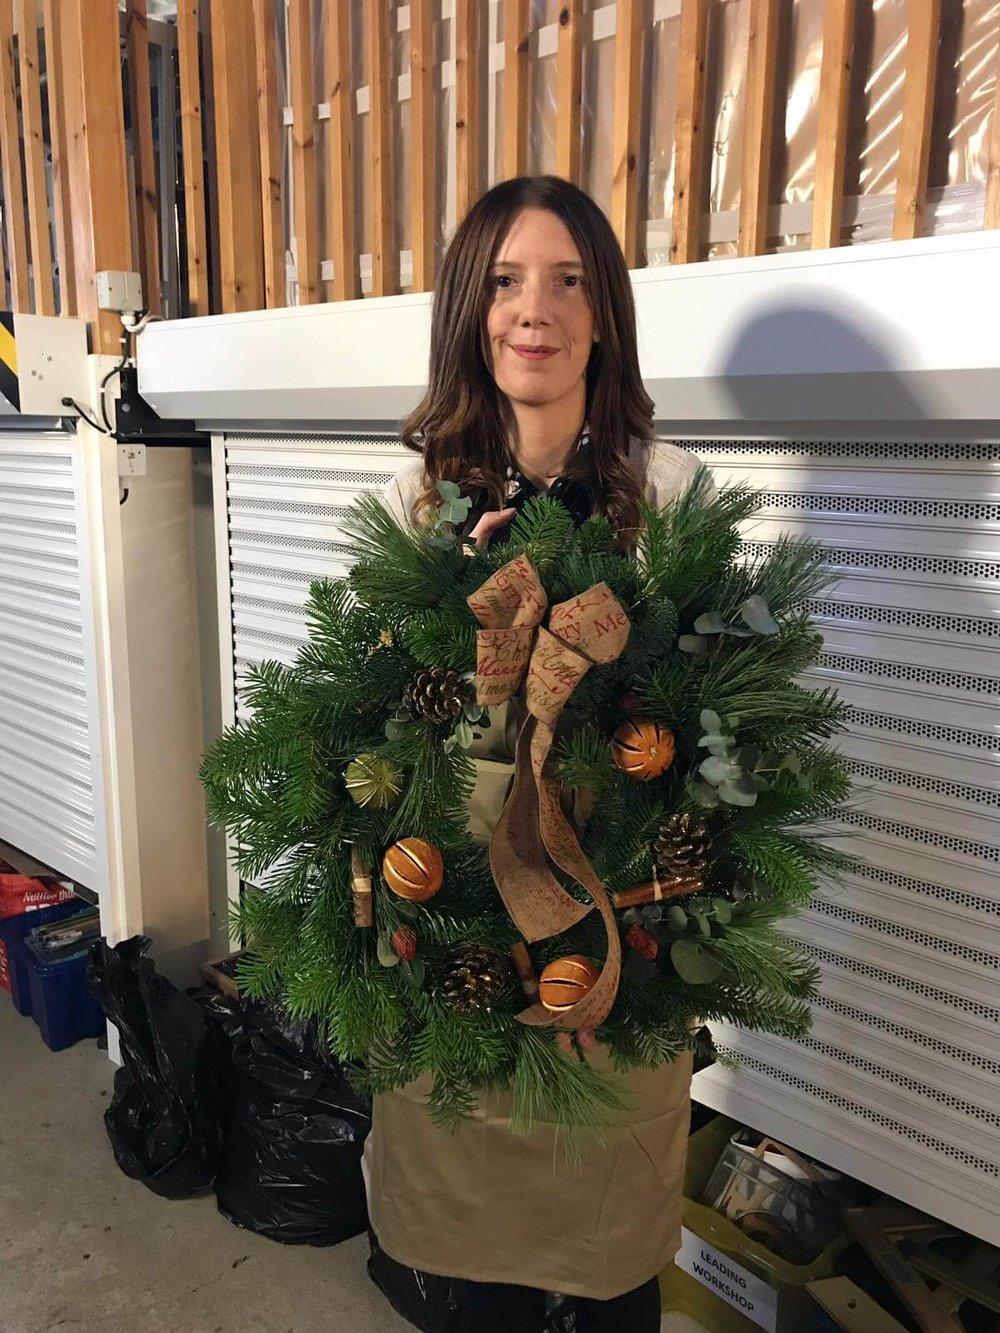 Christmas Wreath Making Workshop Ely Cambridgeshire 2nd December (8).jpg